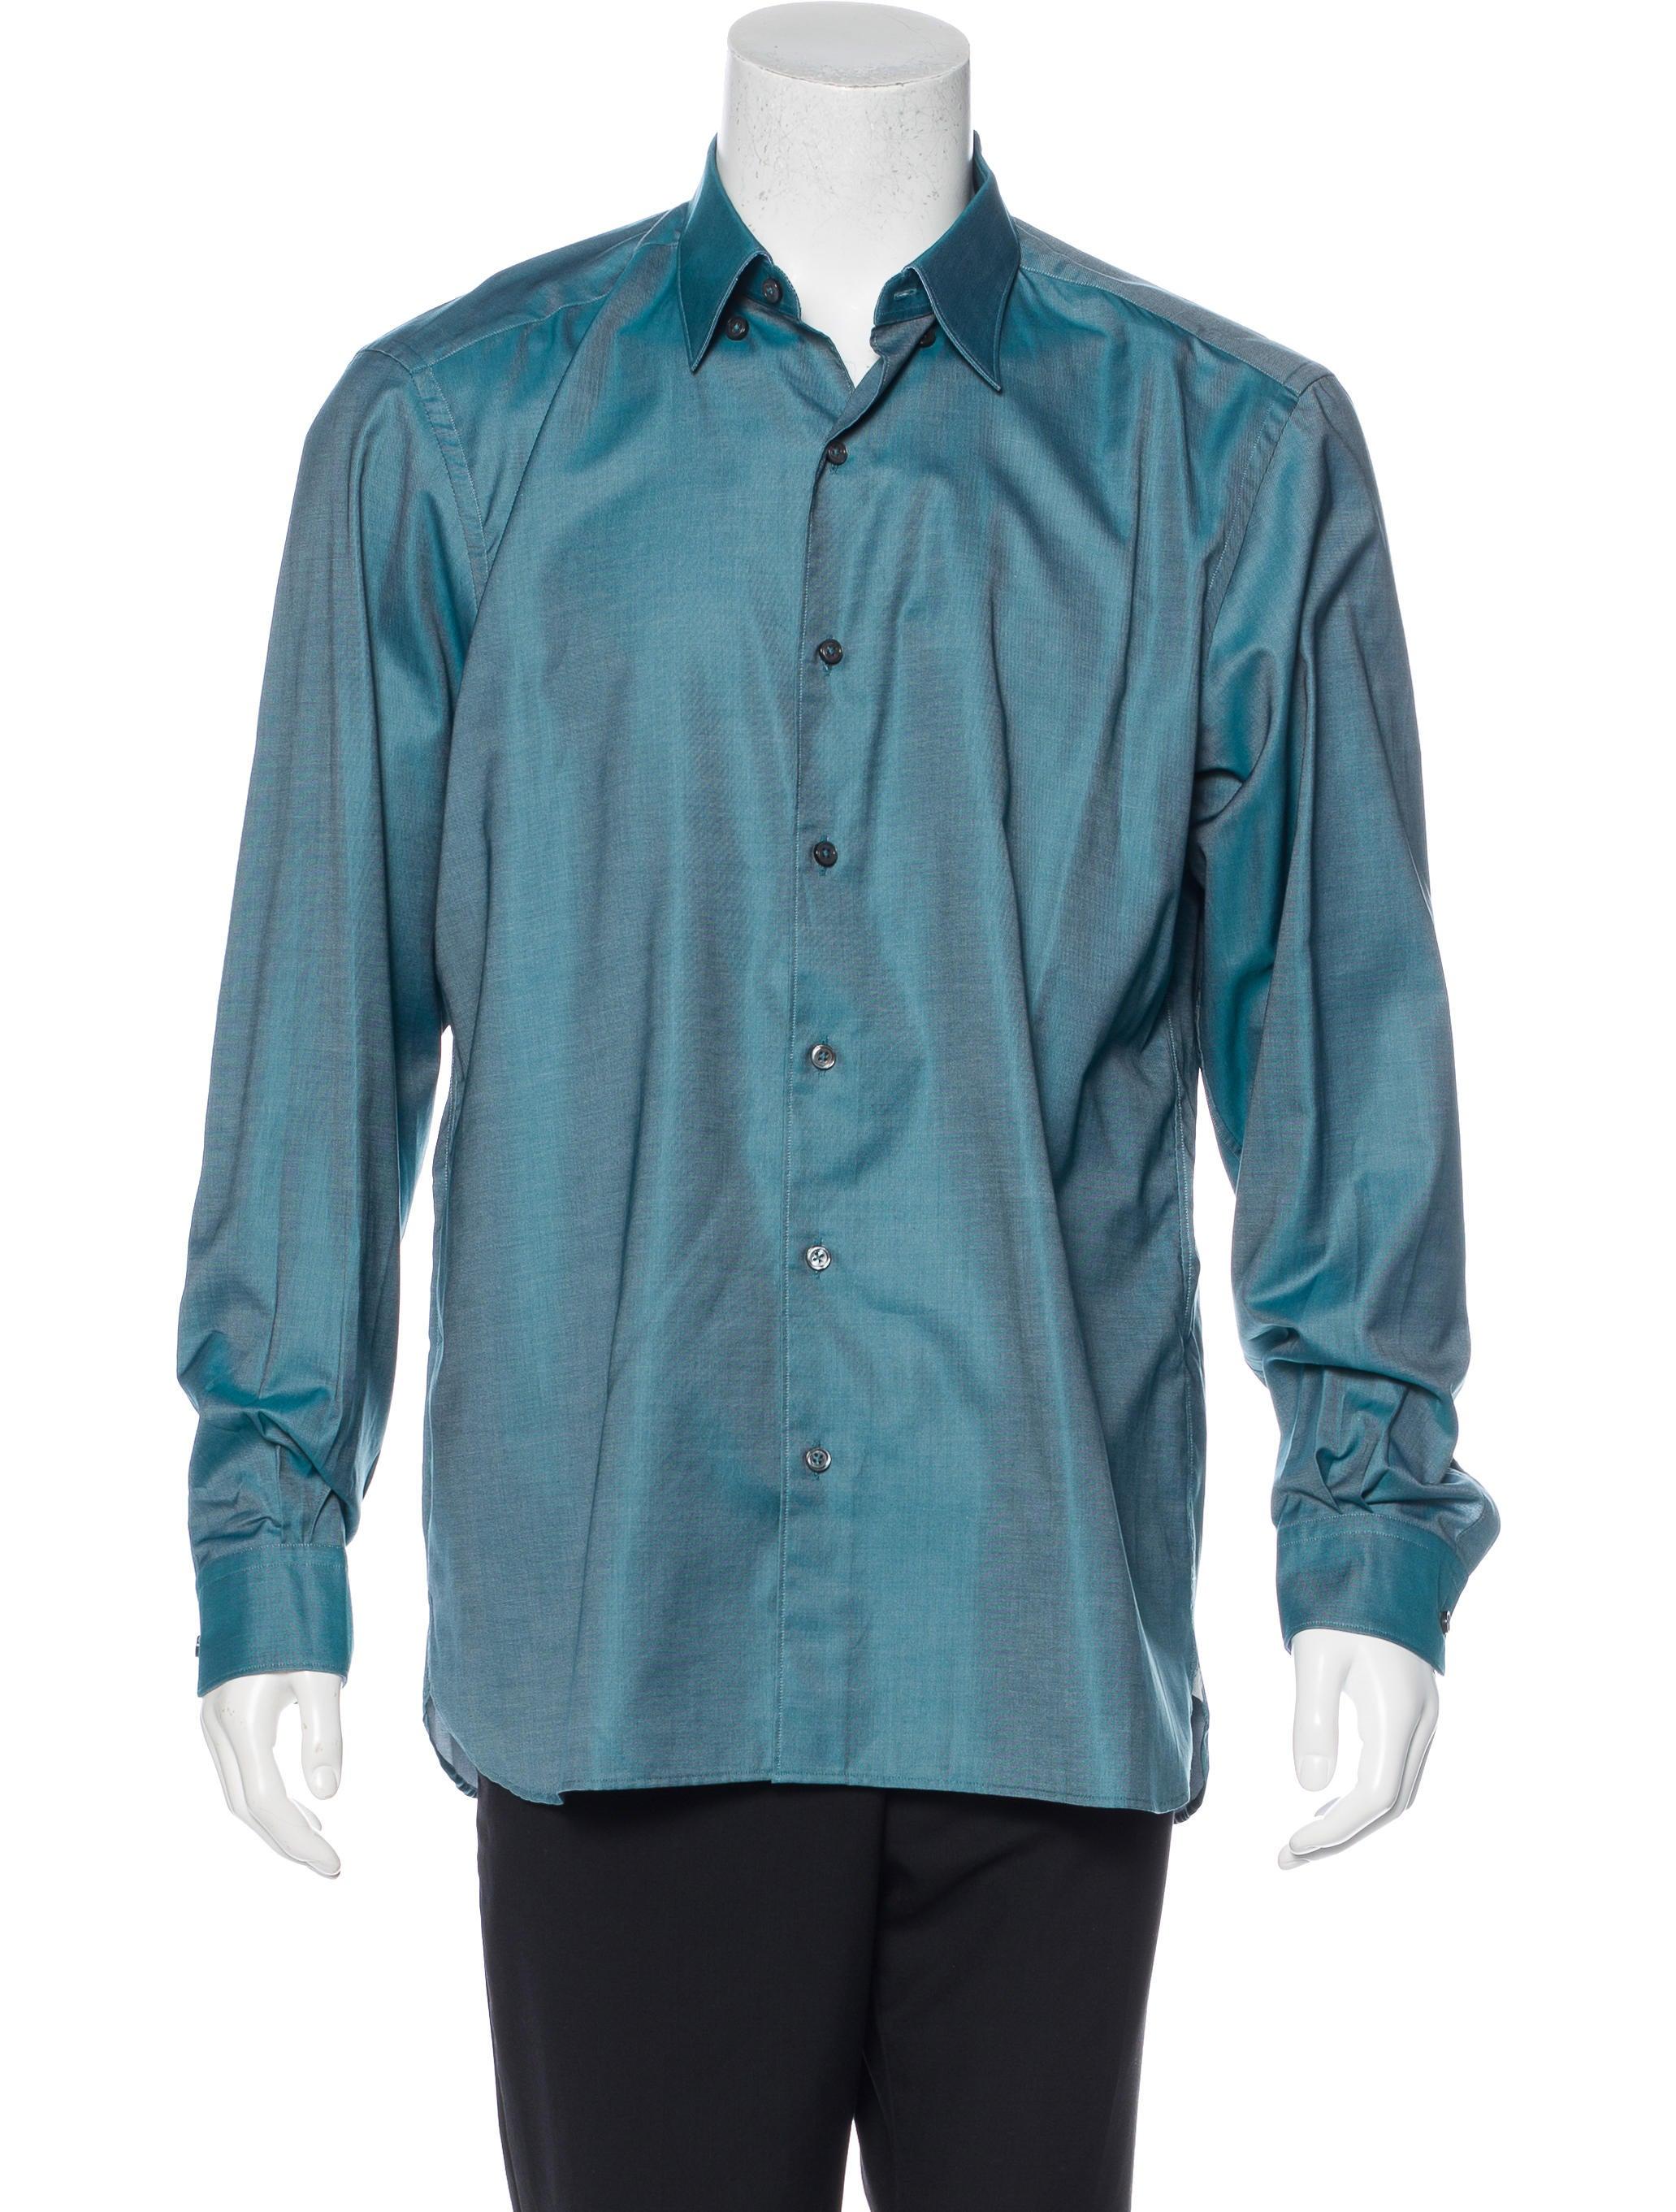 ermenegildo zegna woven button up shirt clothing zgn24567 the realreal. Black Bedroom Furniture Sets. Home Design Ideas